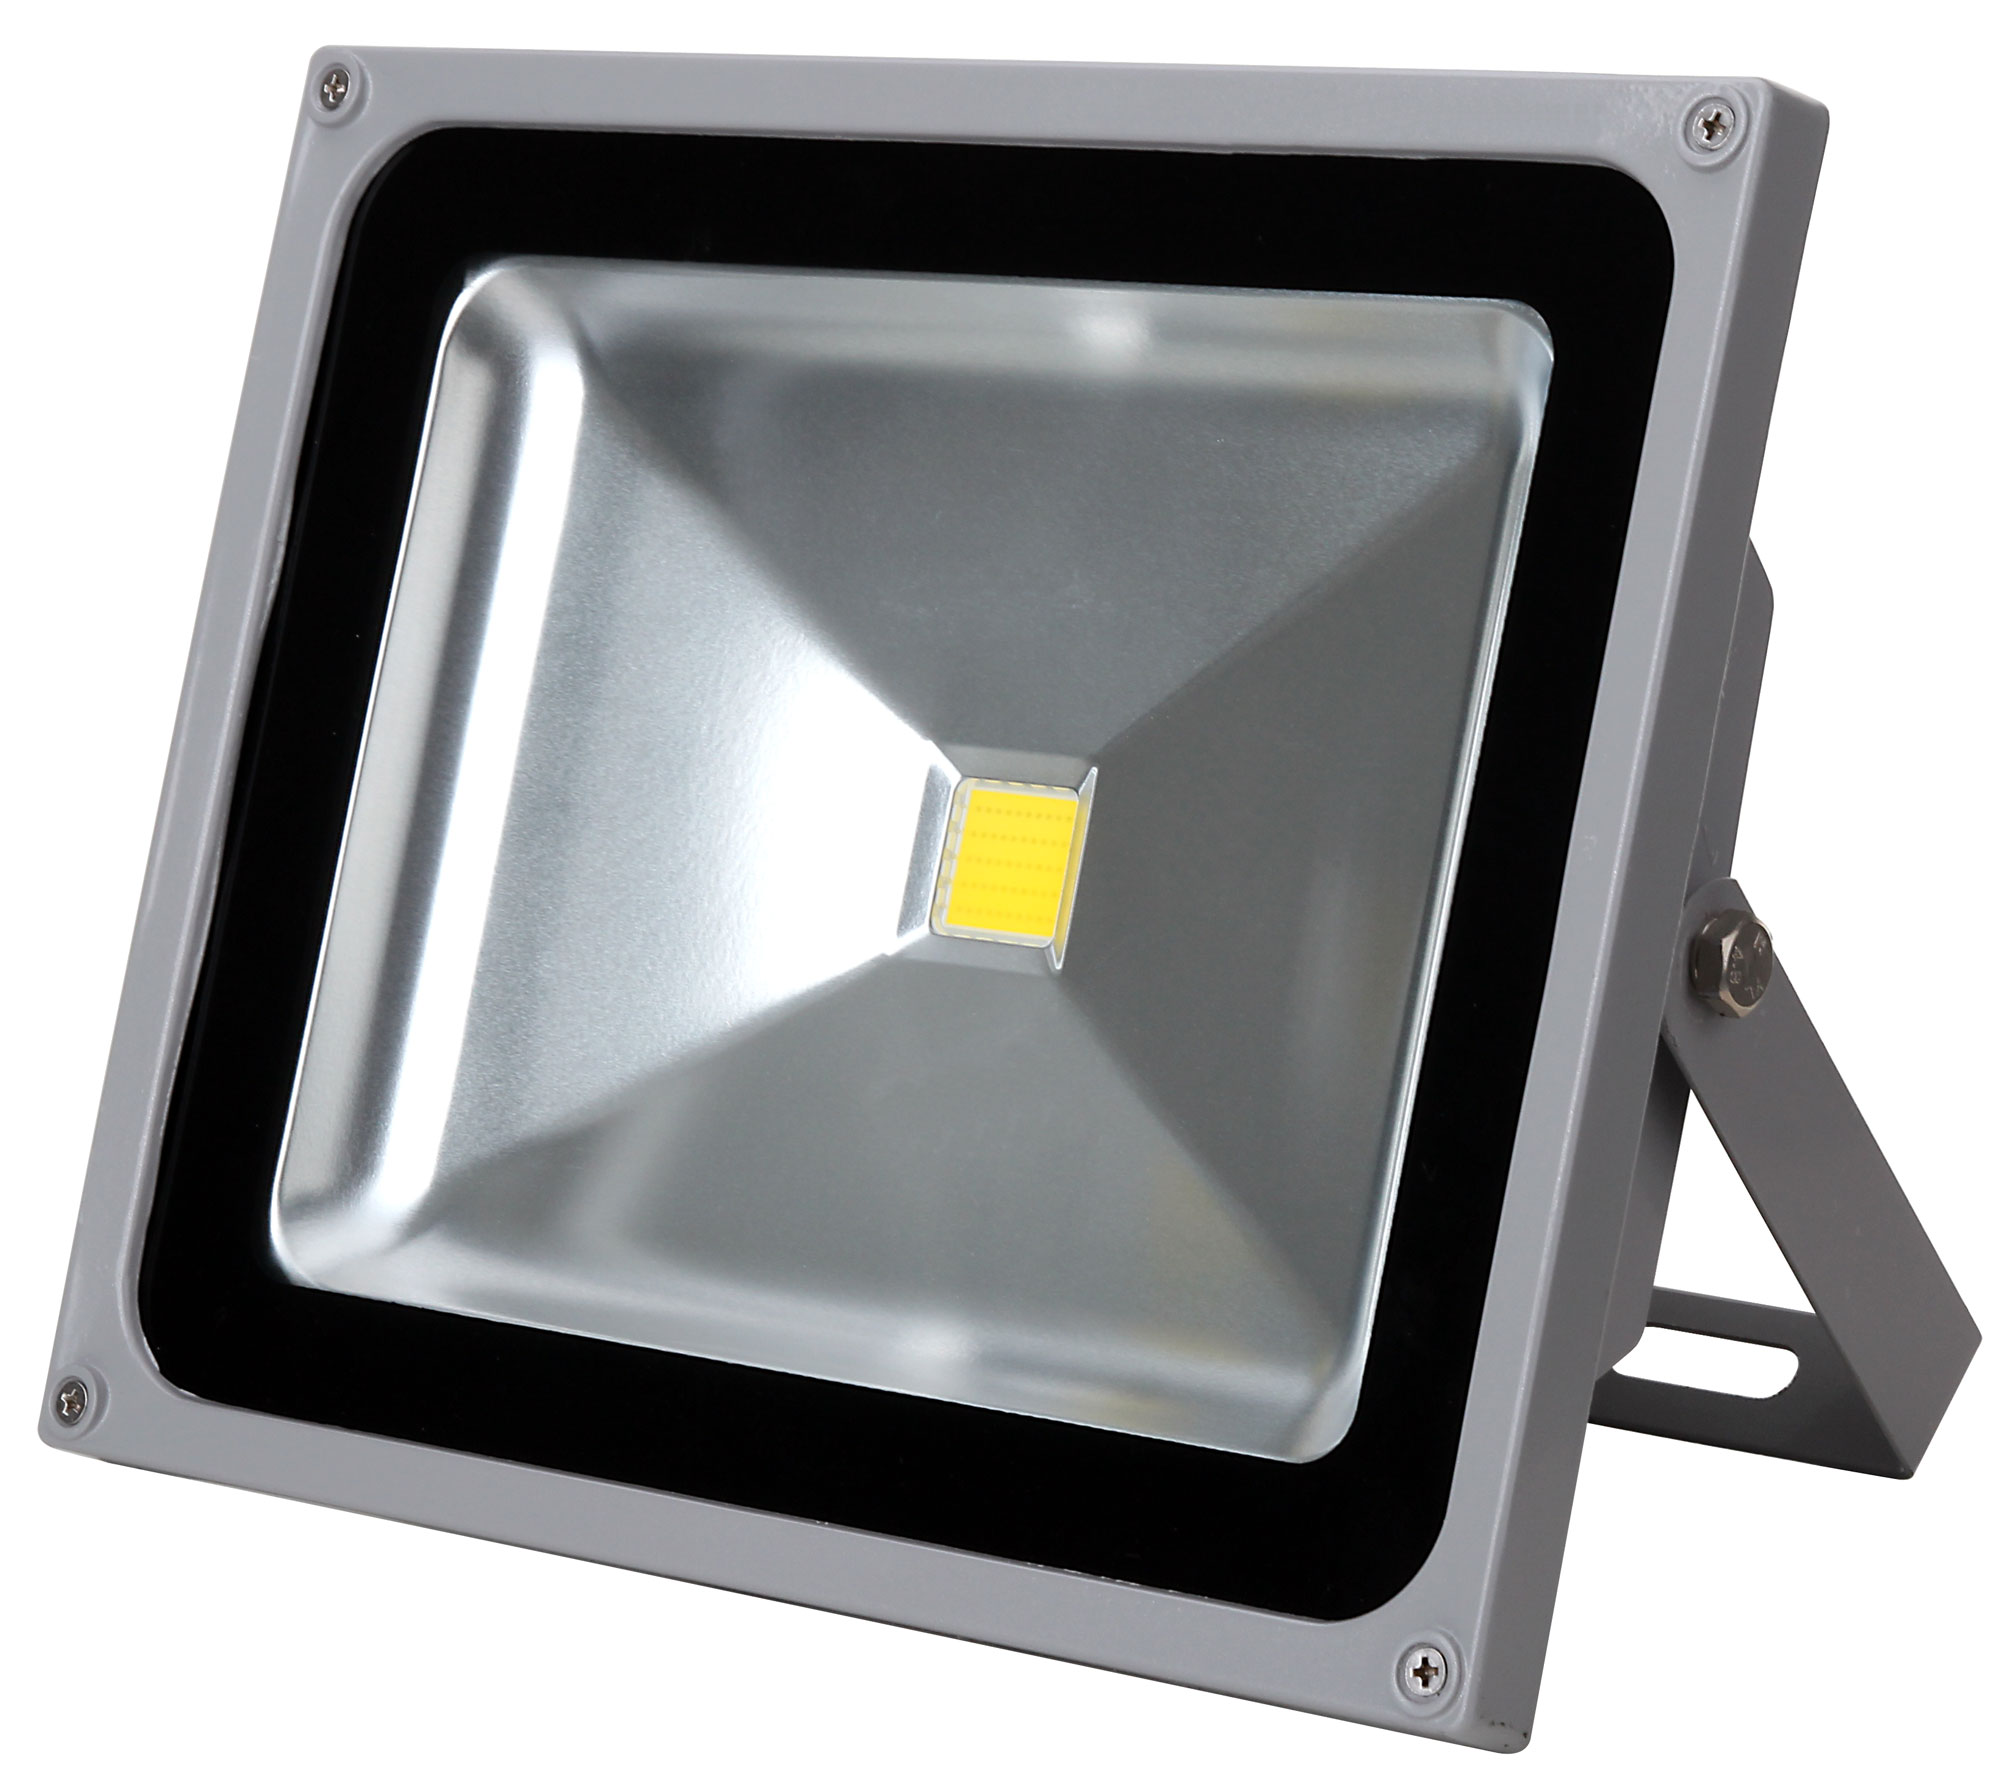 Beliebt Showlite FL-2050 LED Fluter IP65 50 Watt 5500 Lumen NQ12